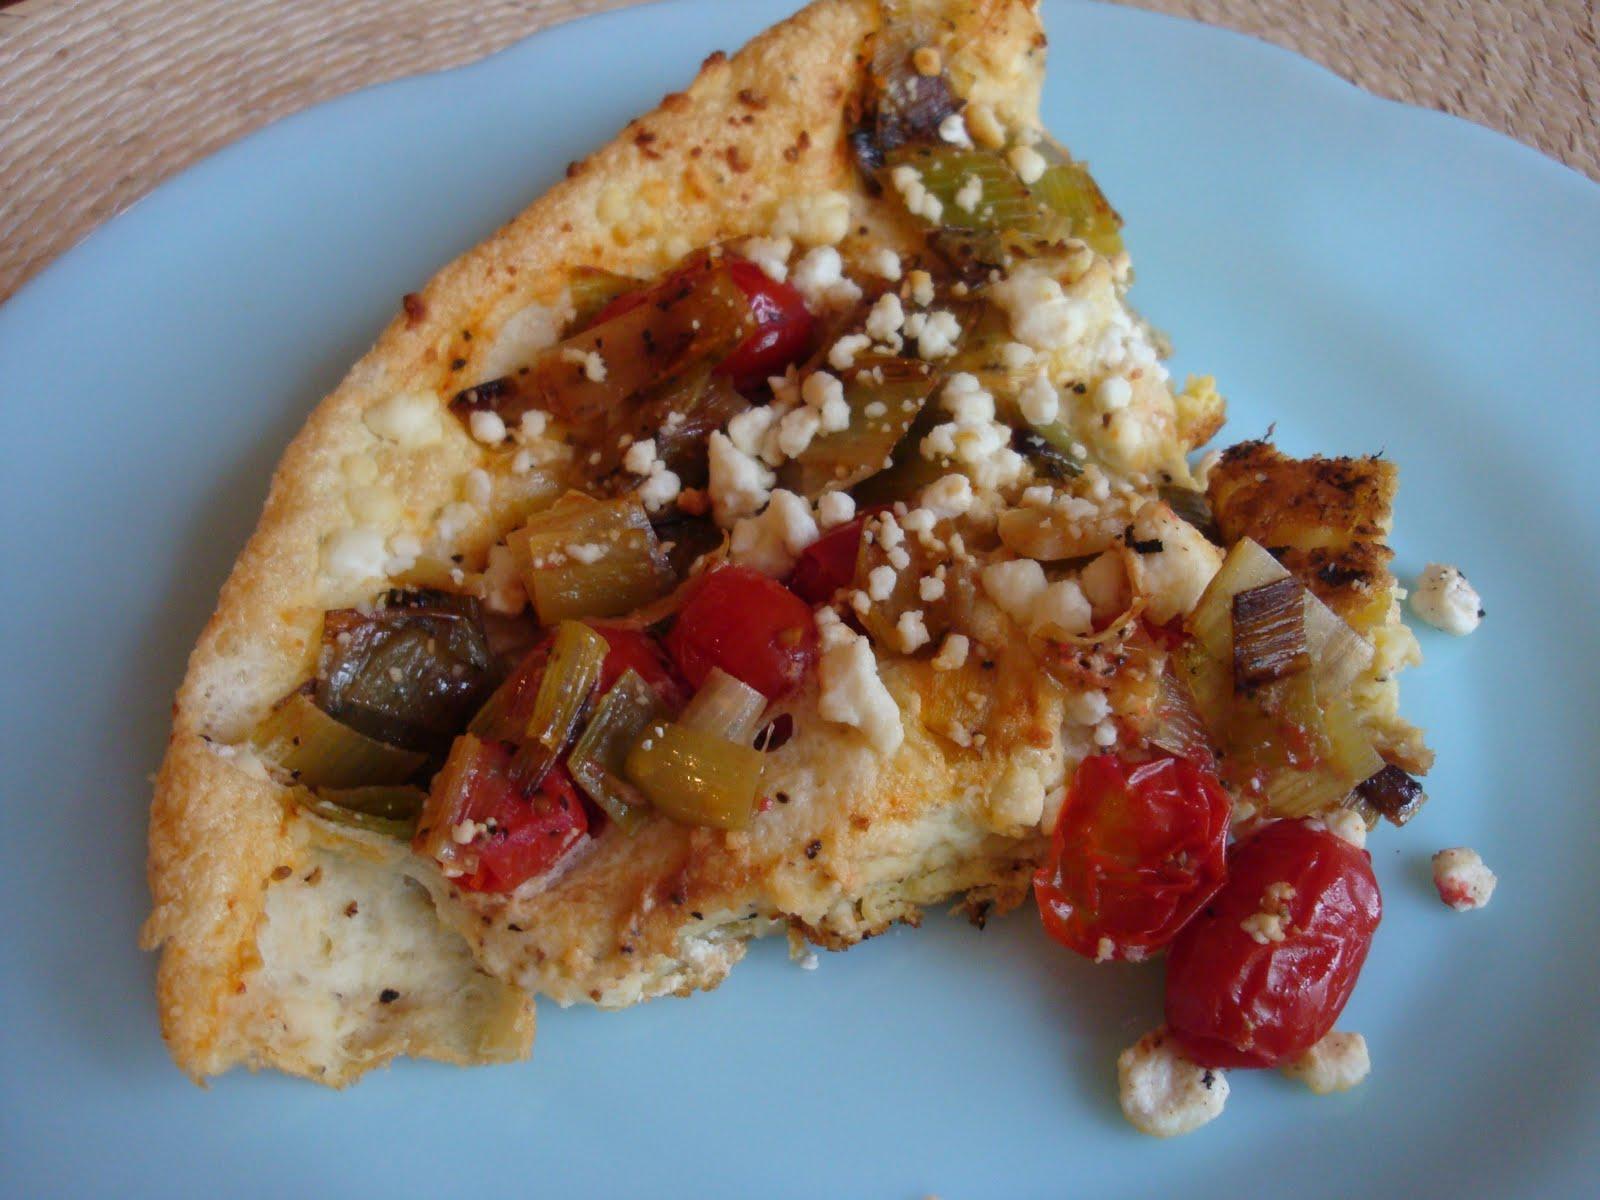 Tomato Leek Frittata with Goat Cheese - Alida's Kitchen